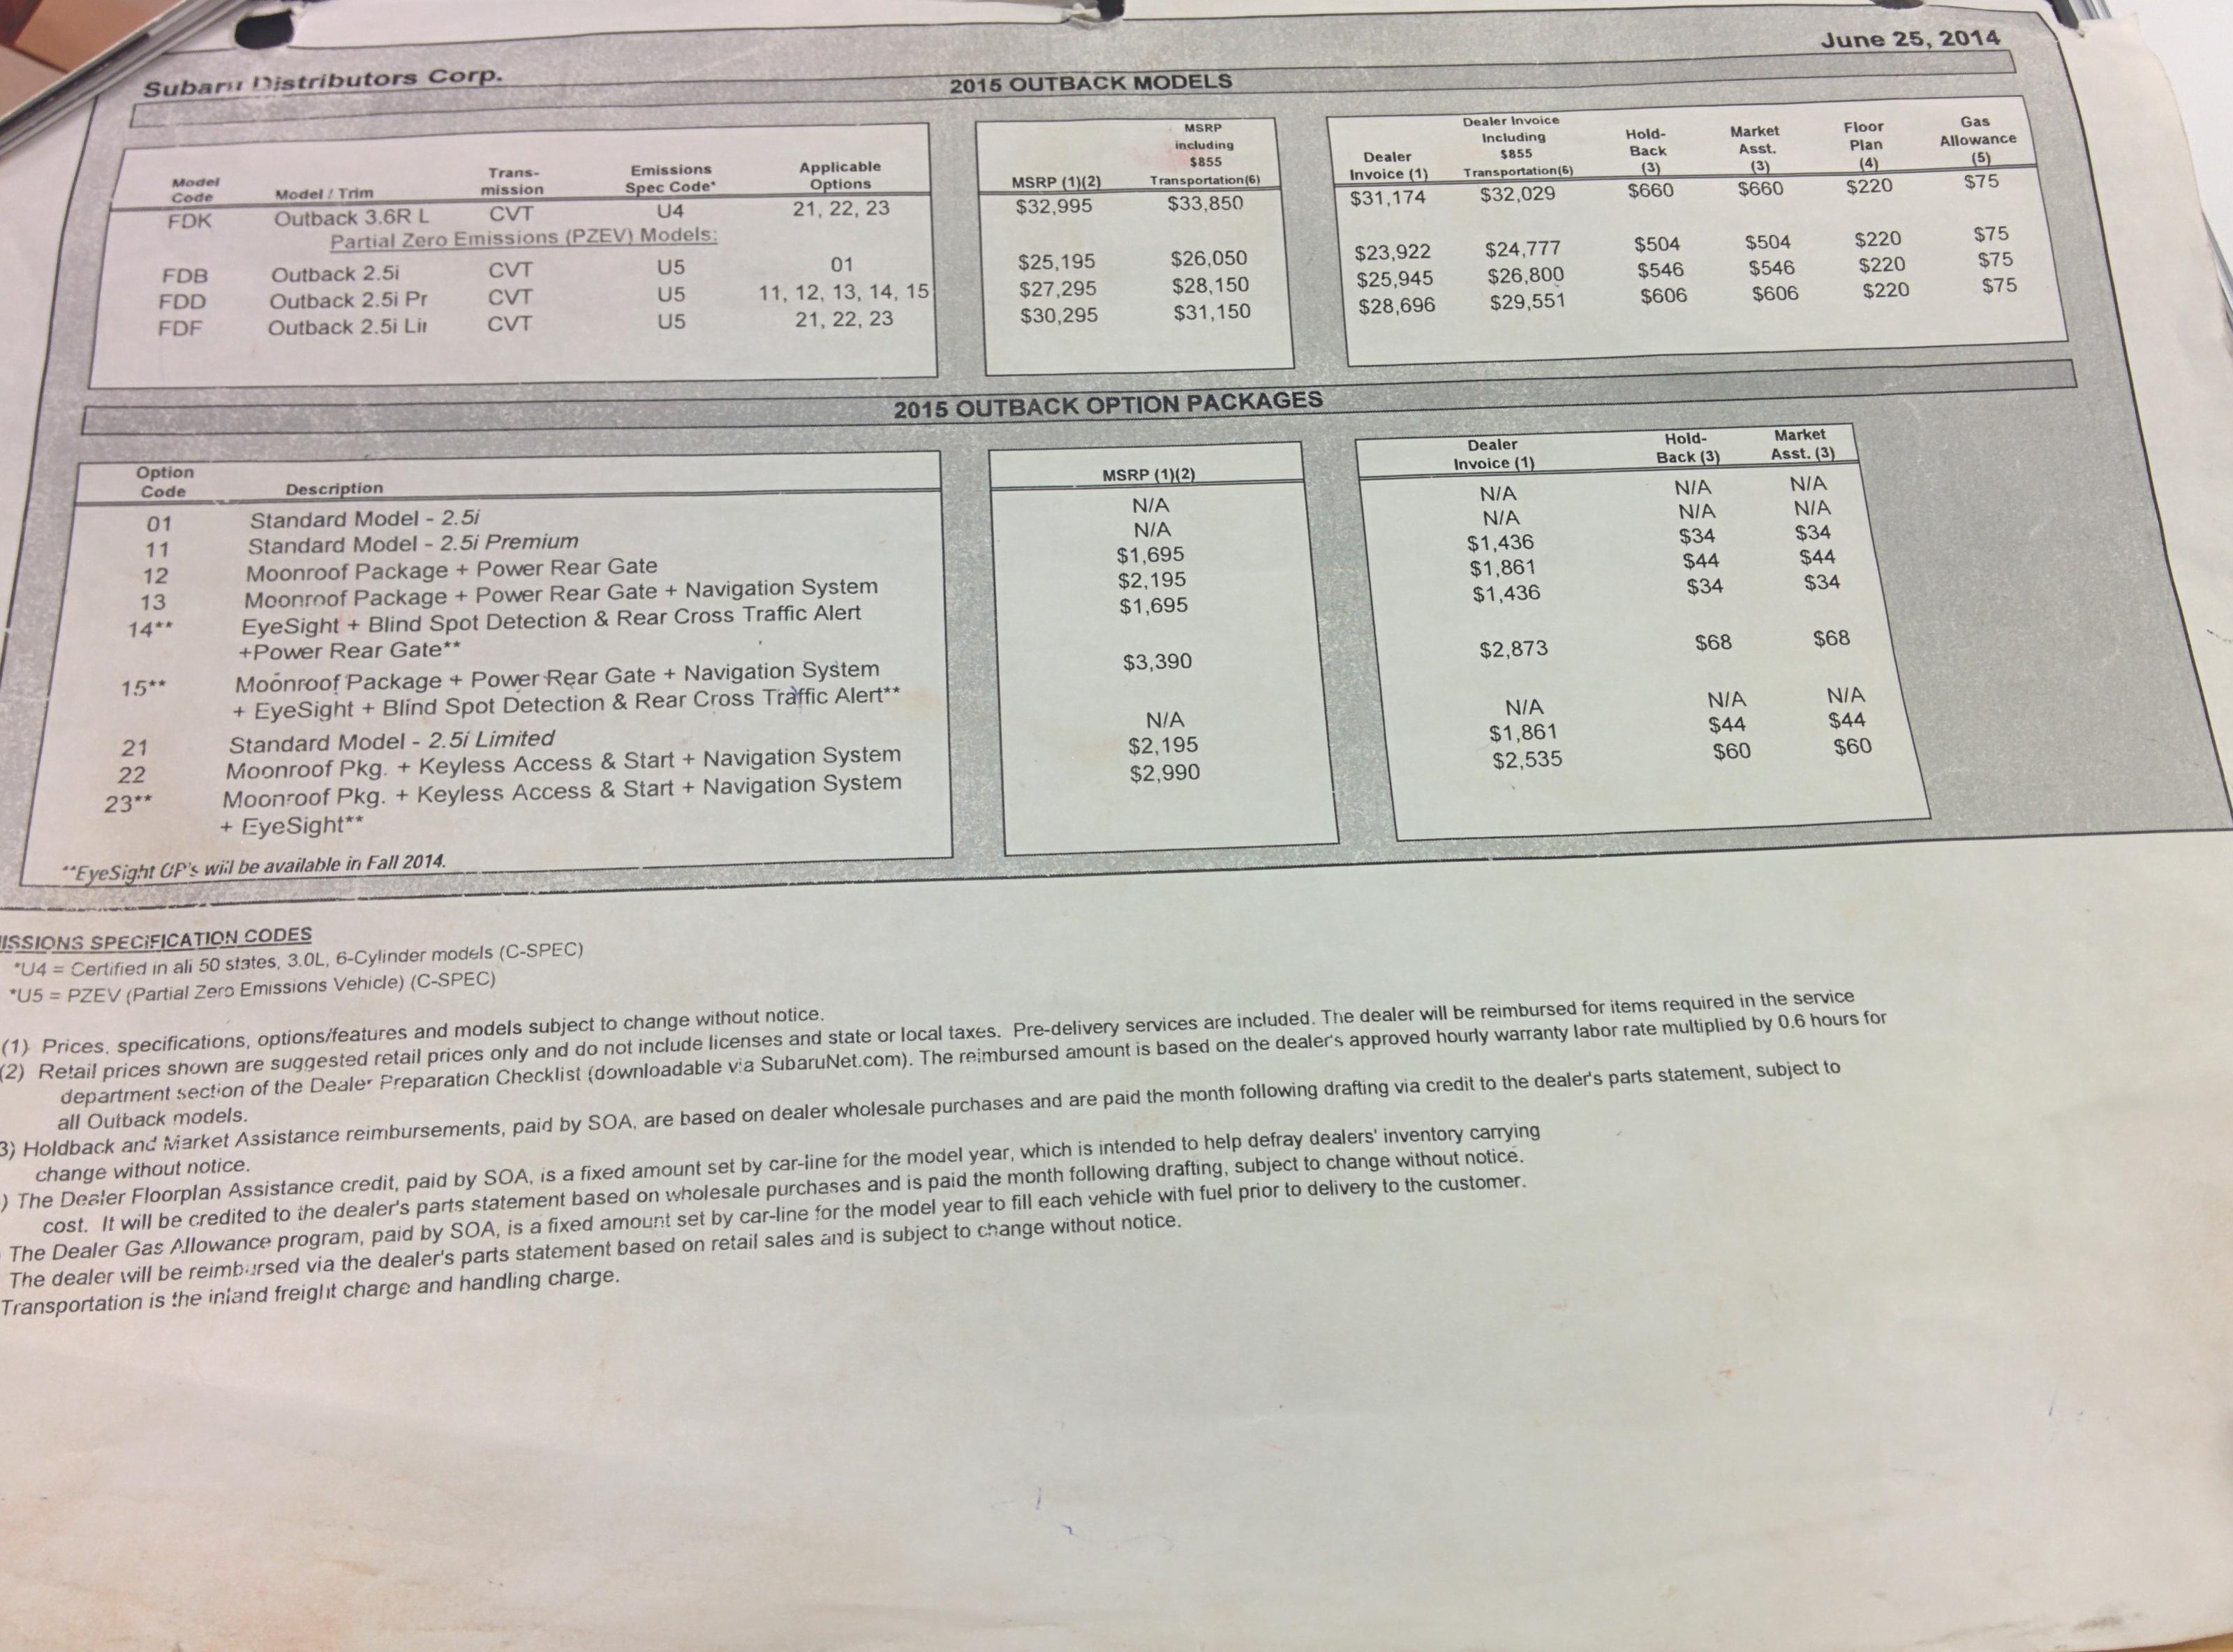 Attachments Subaru Outback Subaru Outback Forums - 2018 subaru legacy invoice price